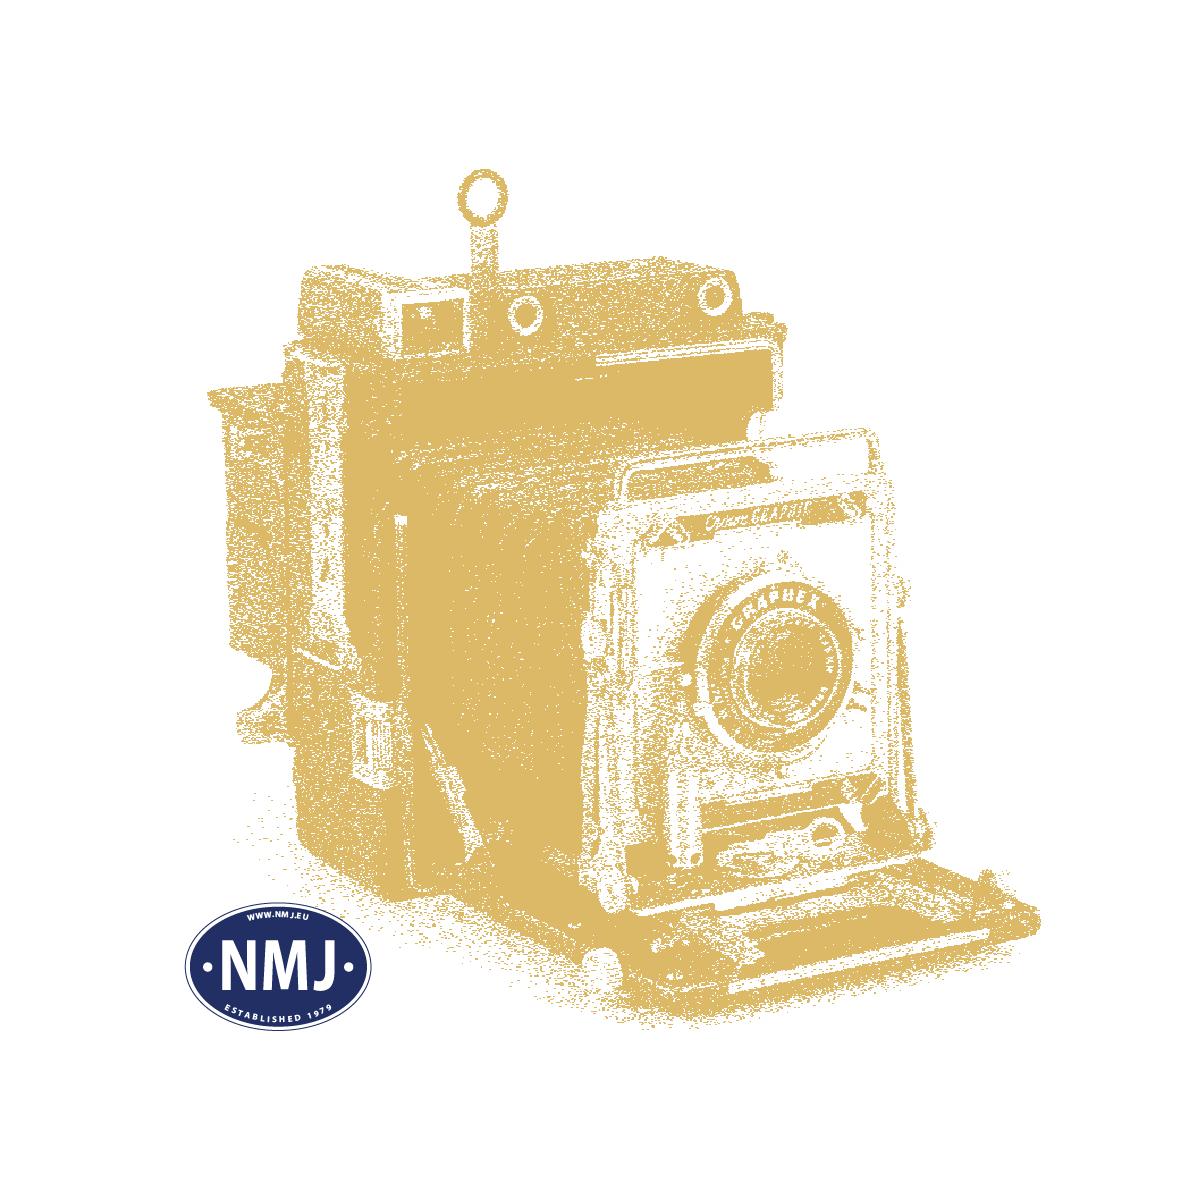 NMJT204.003 - NMJ Topline SJ Bo1K.4920, 2 Cl. Passenger coach, old SJ logo